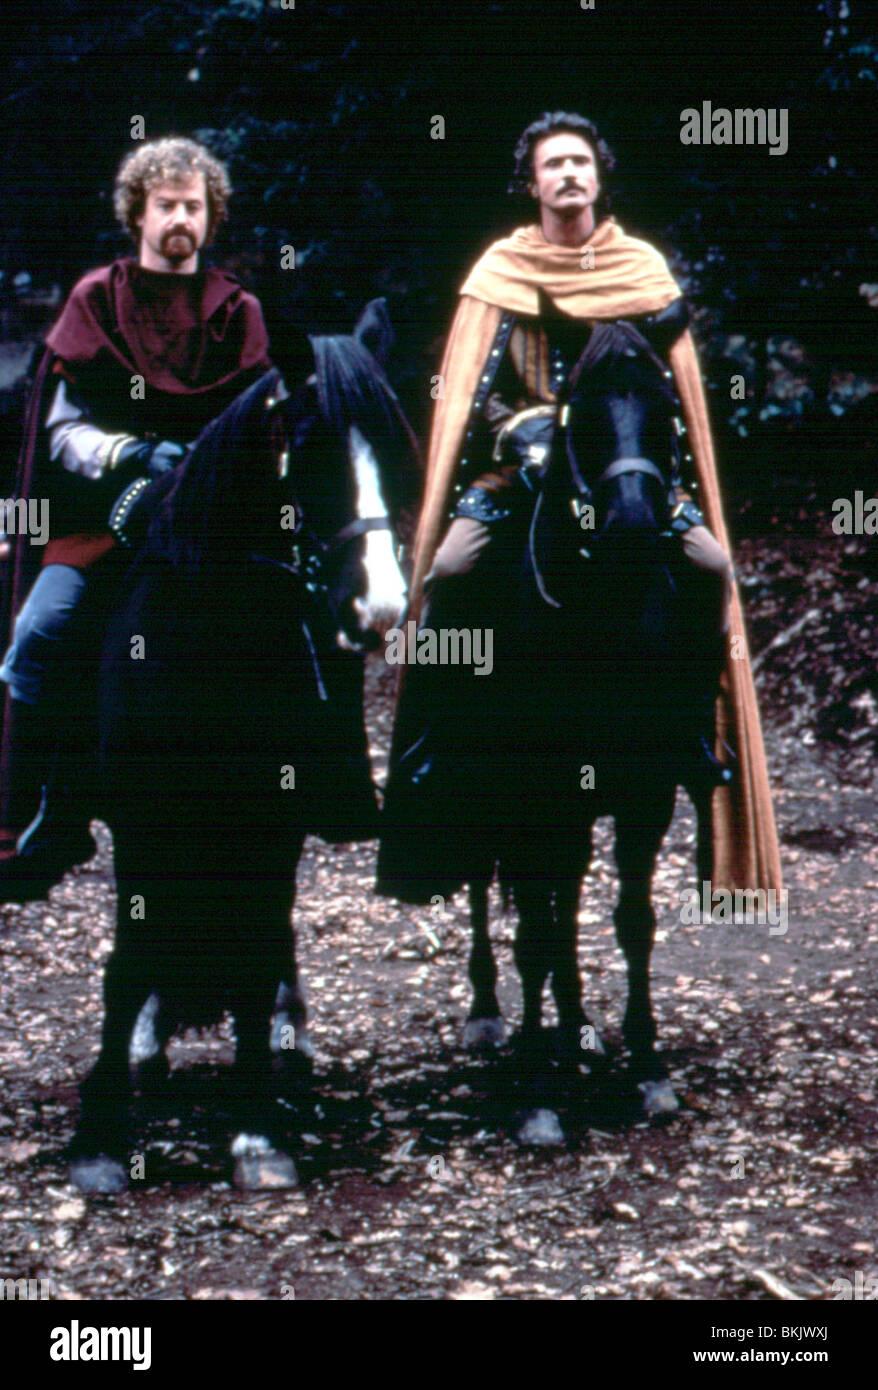 ROBIN HOOD (TVM-1990) OWEN TEALE, PATRICK BERGEN, JOHN IRVIN (DIR) RBH 037 - Stock Image